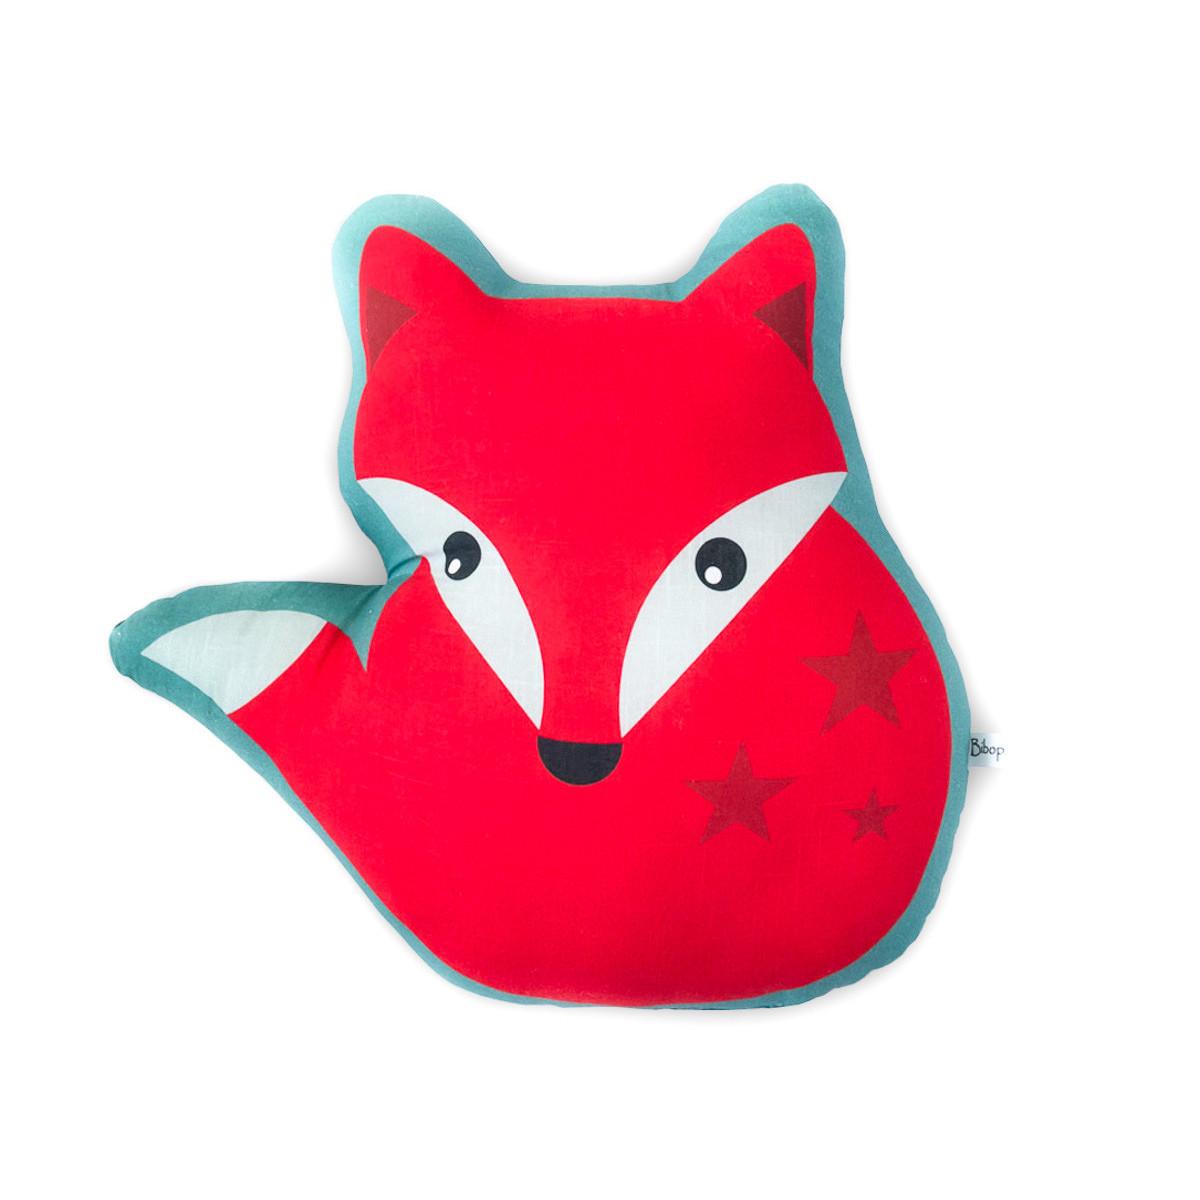 Coussin renard roux